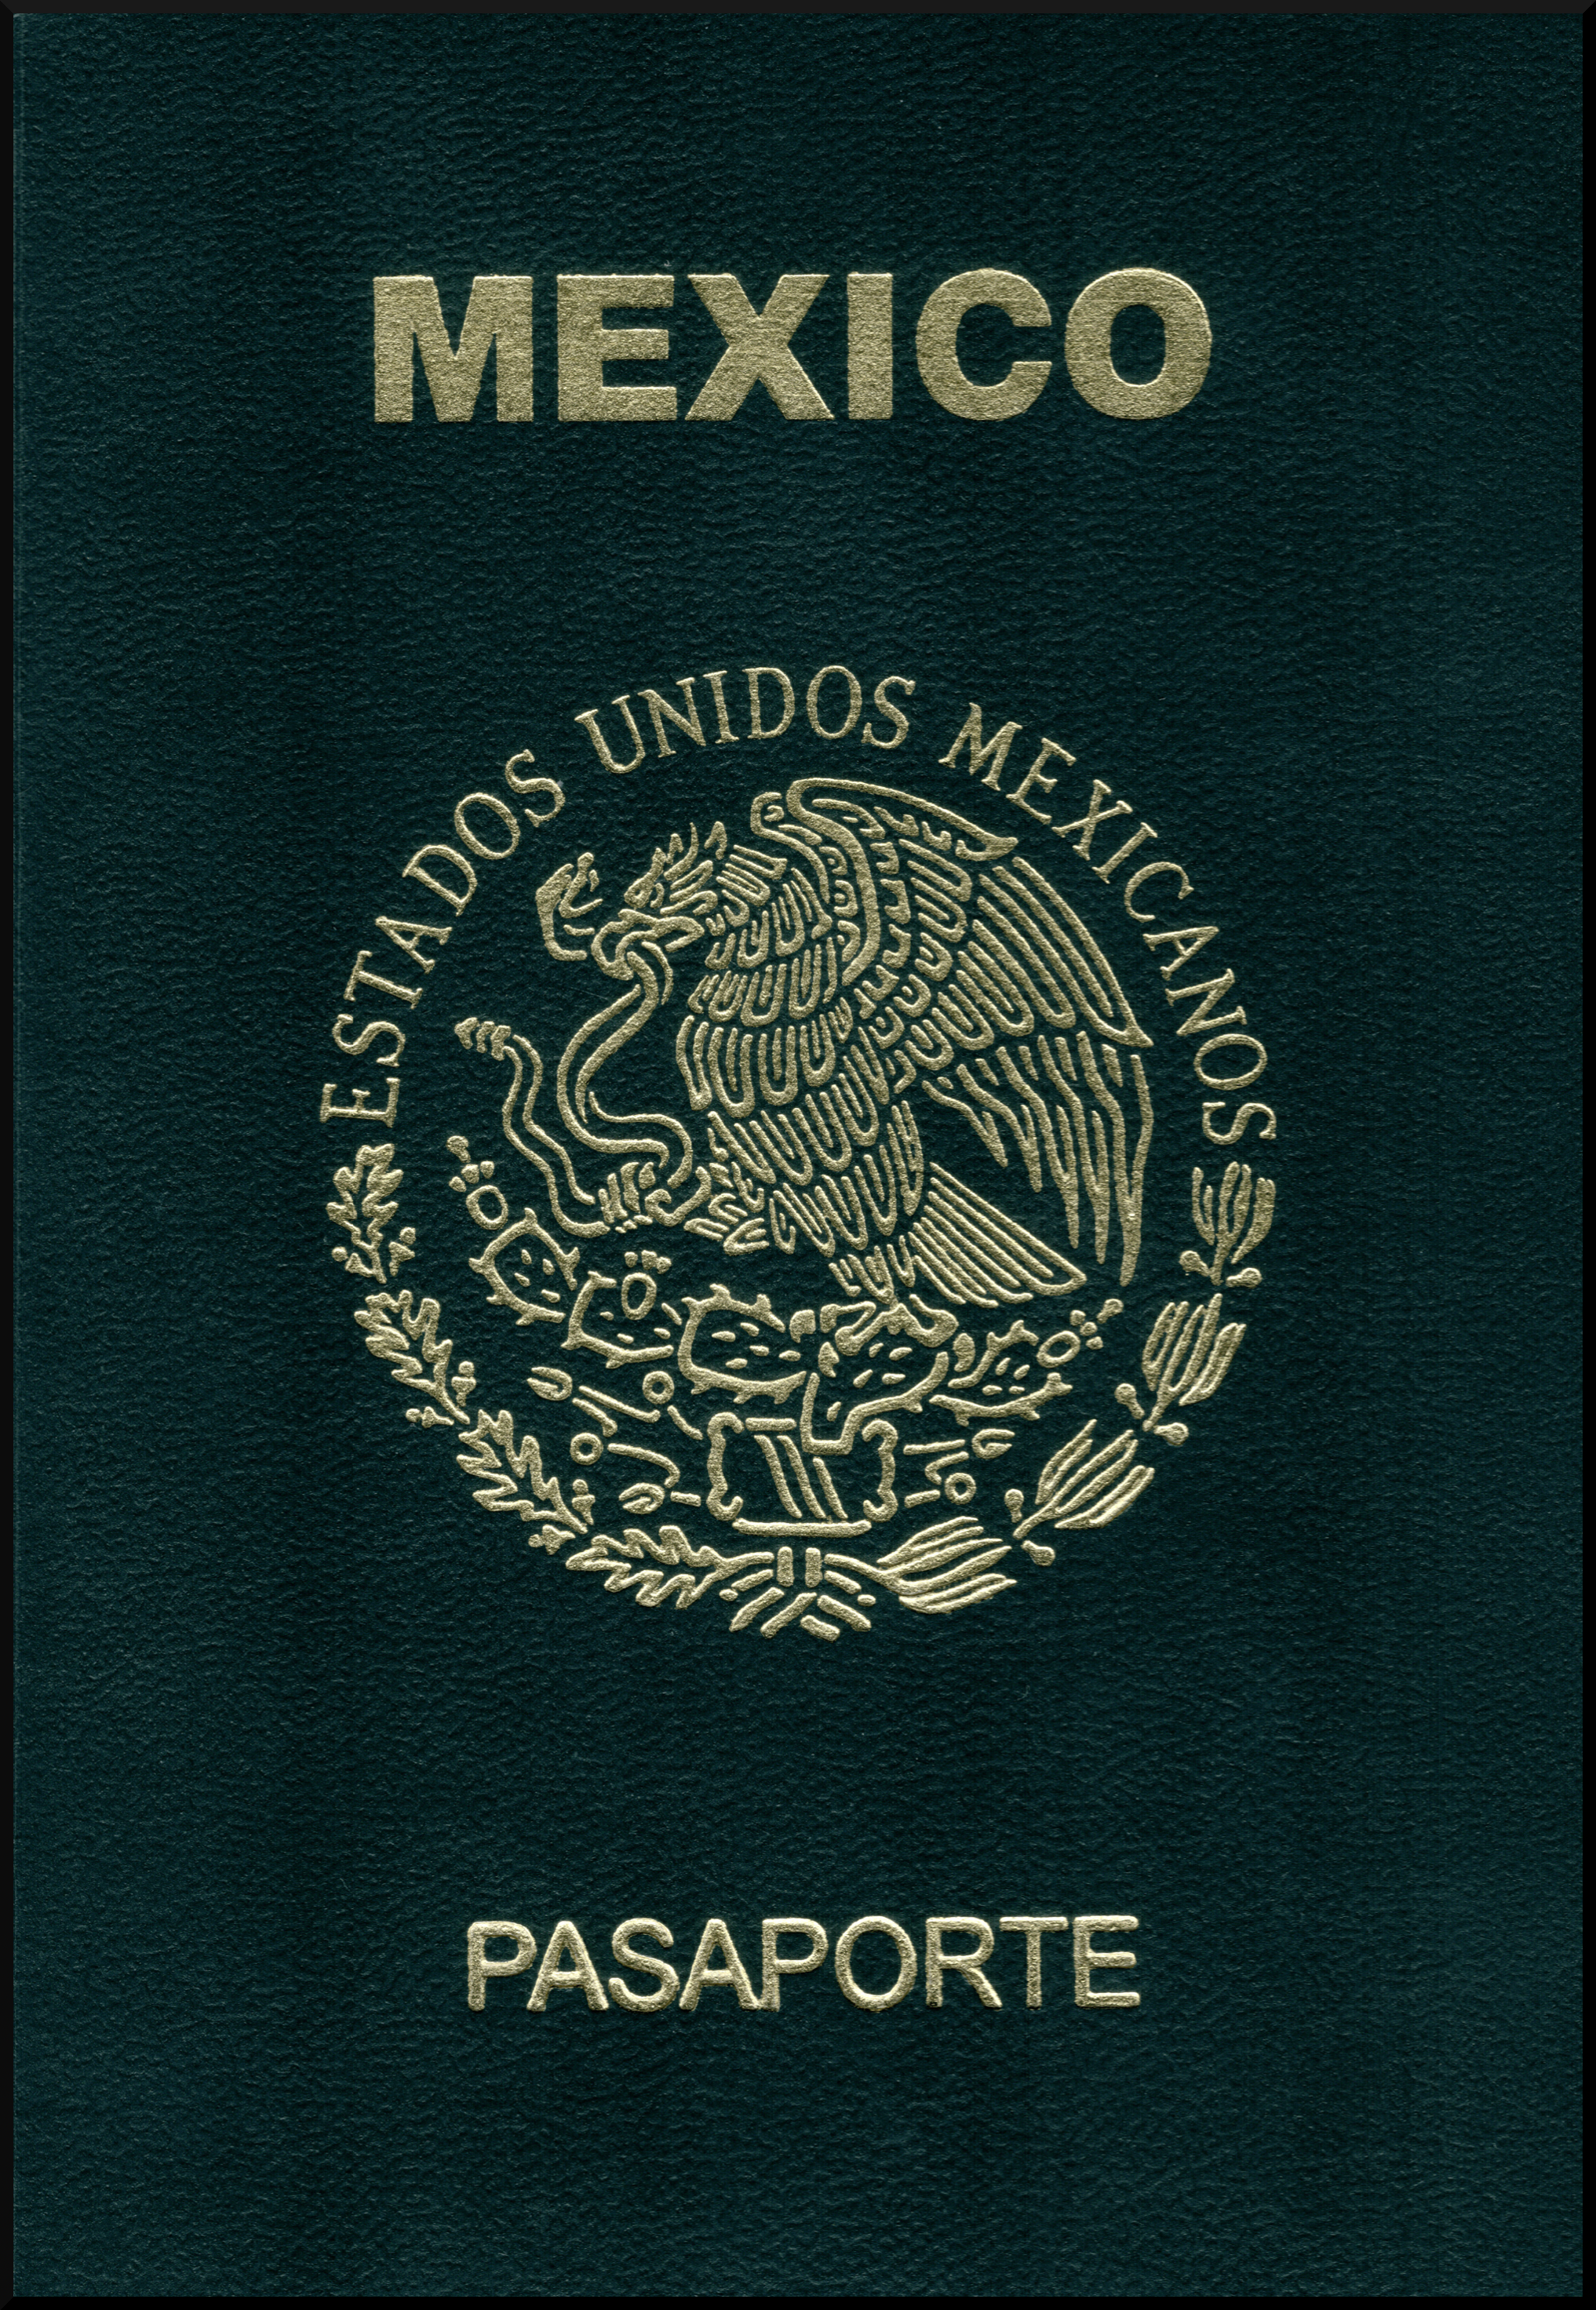 Паспорт Мексики